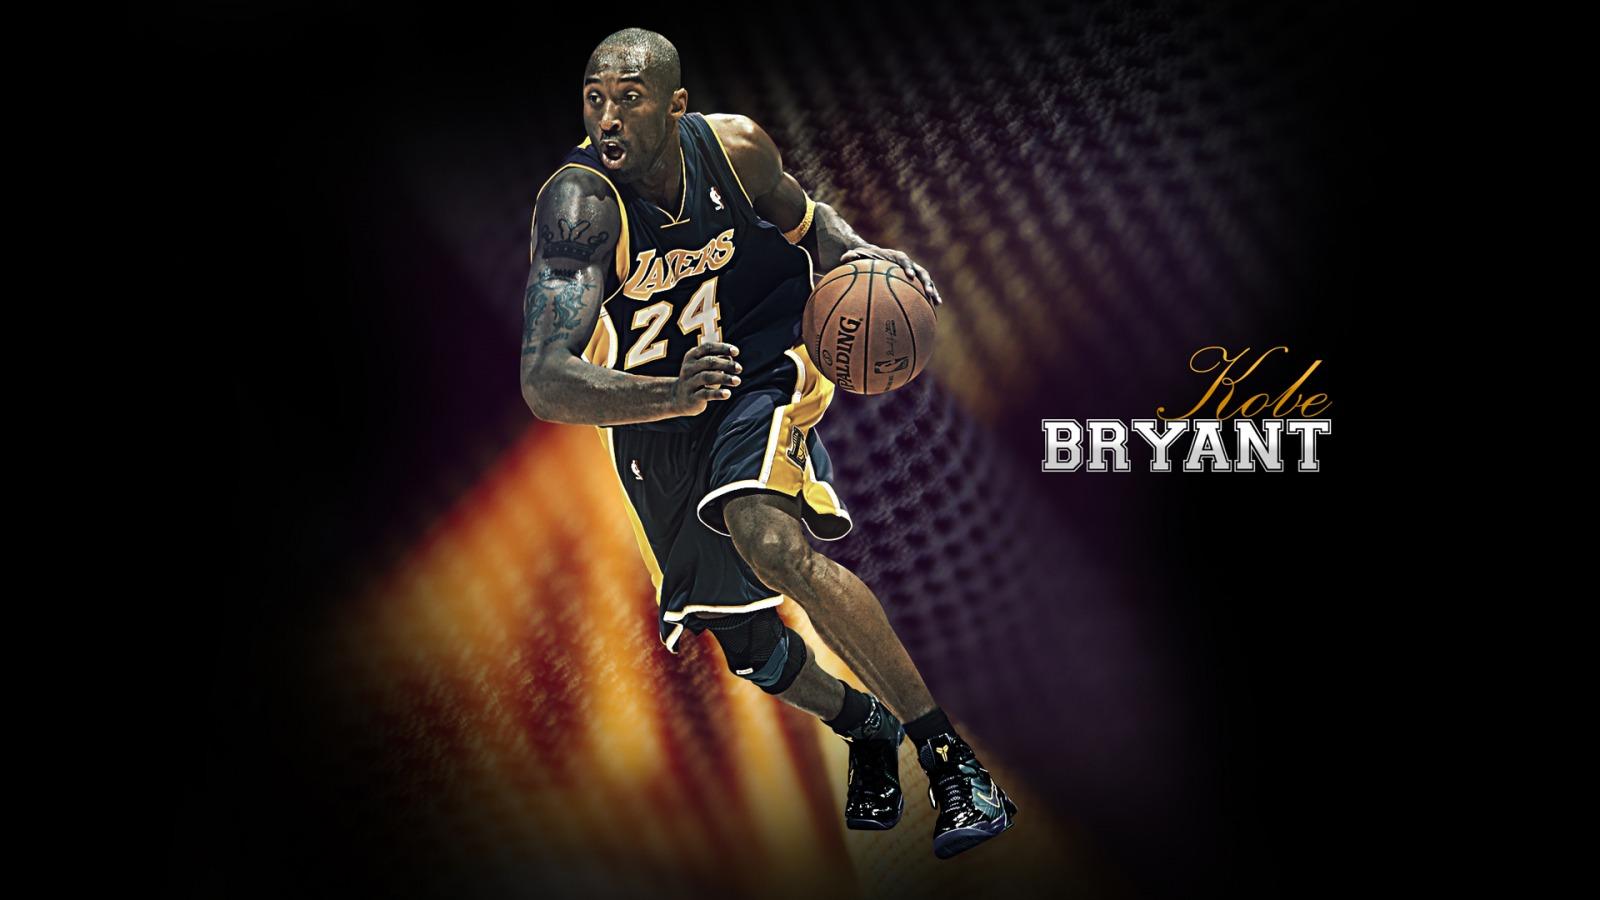 Kobe bryant wallpaper nba sports wallpapers in jpg format - Kobe bryant wallpaper free download ...